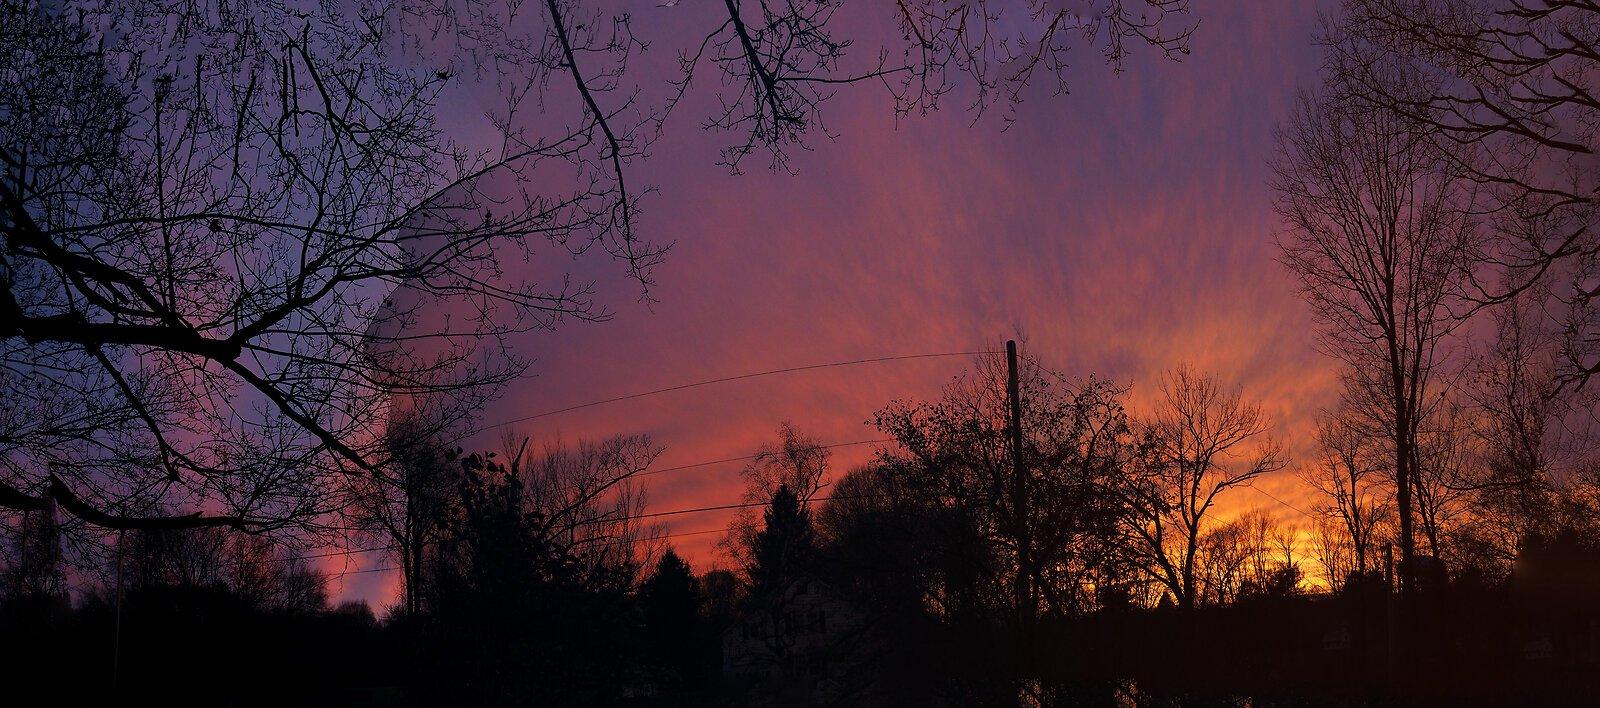 RX10 blazing sunset 003_stitch.jpg